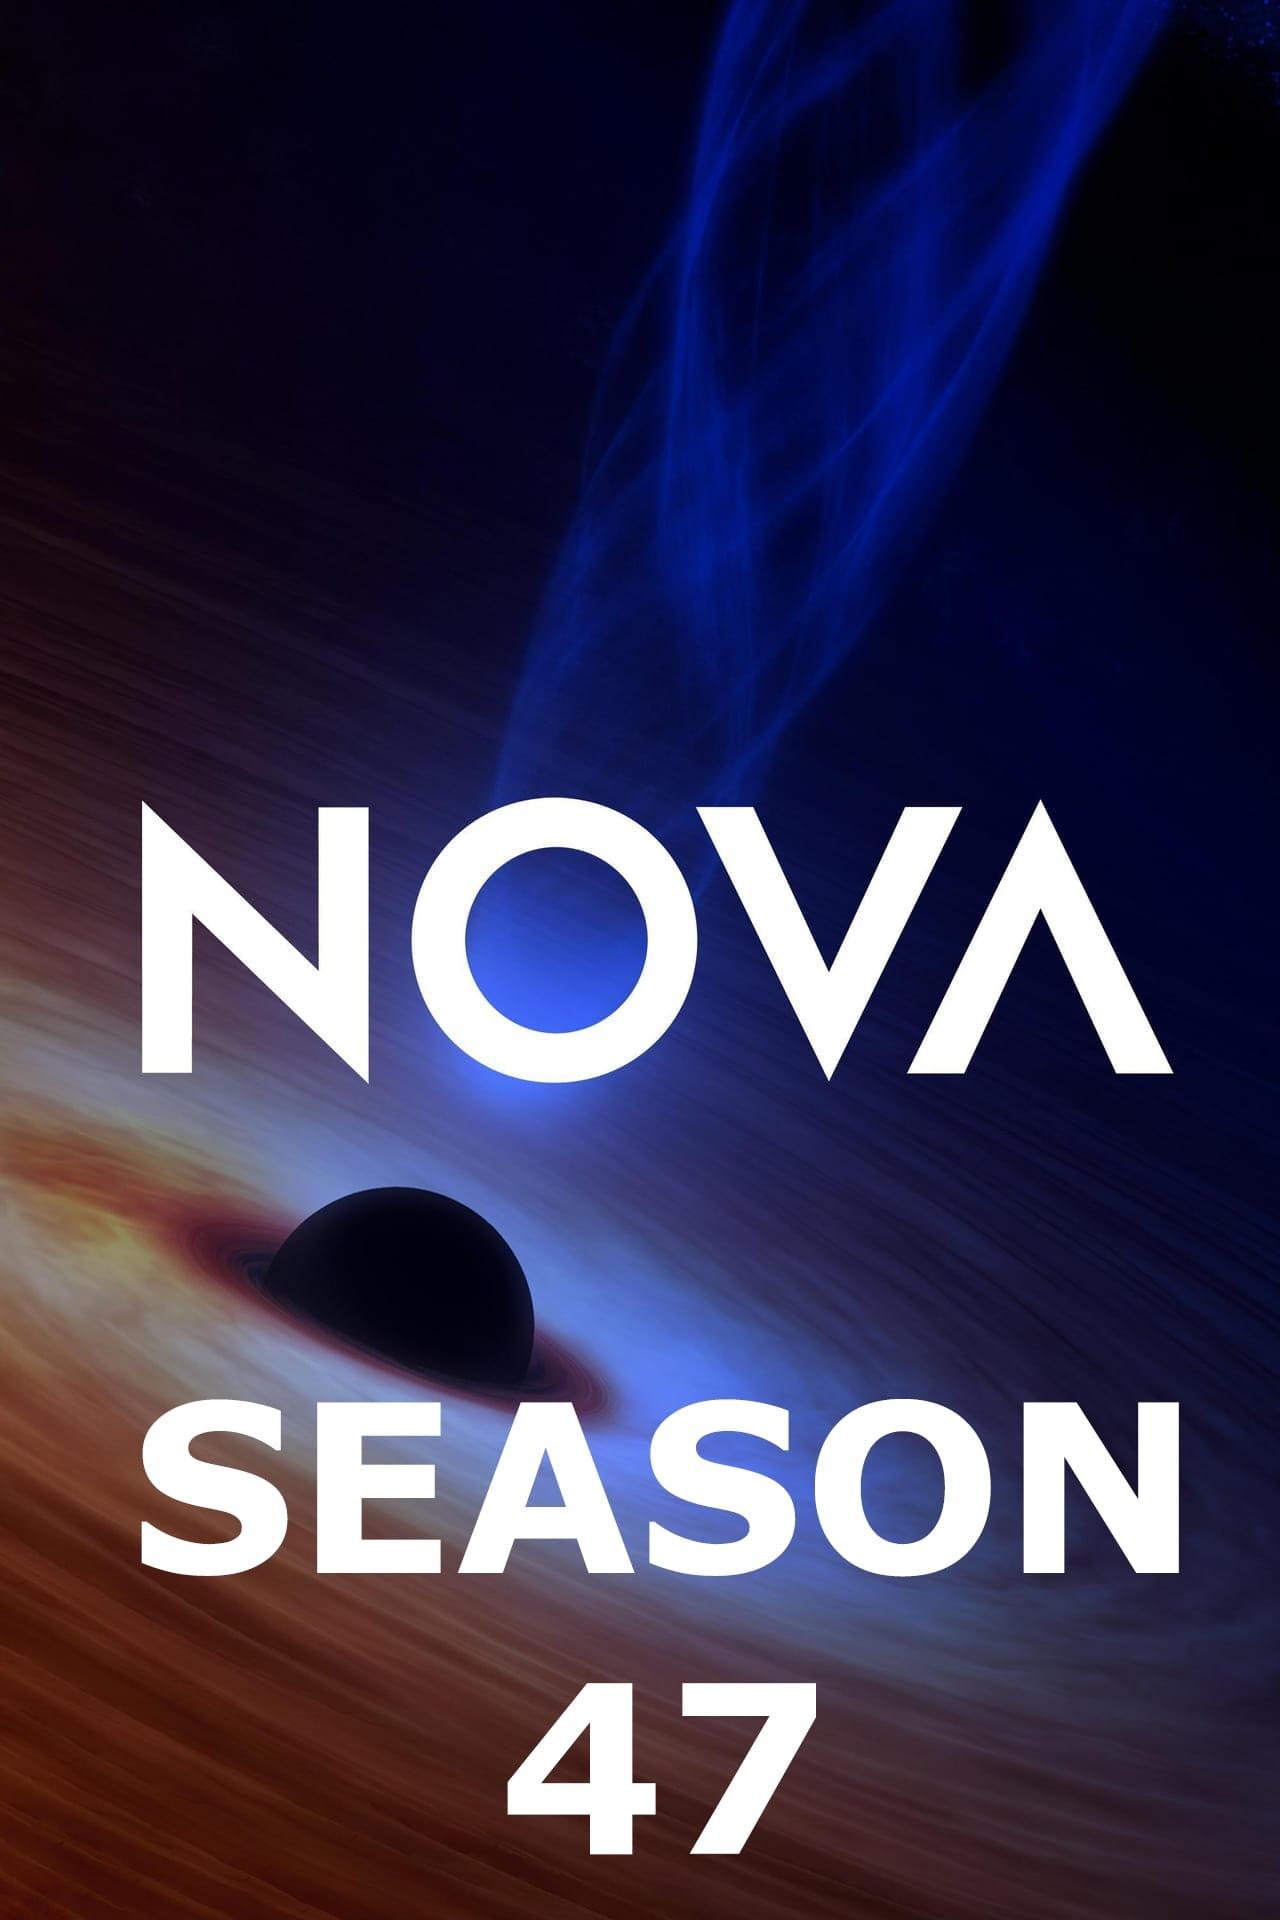 NOVA Season 47